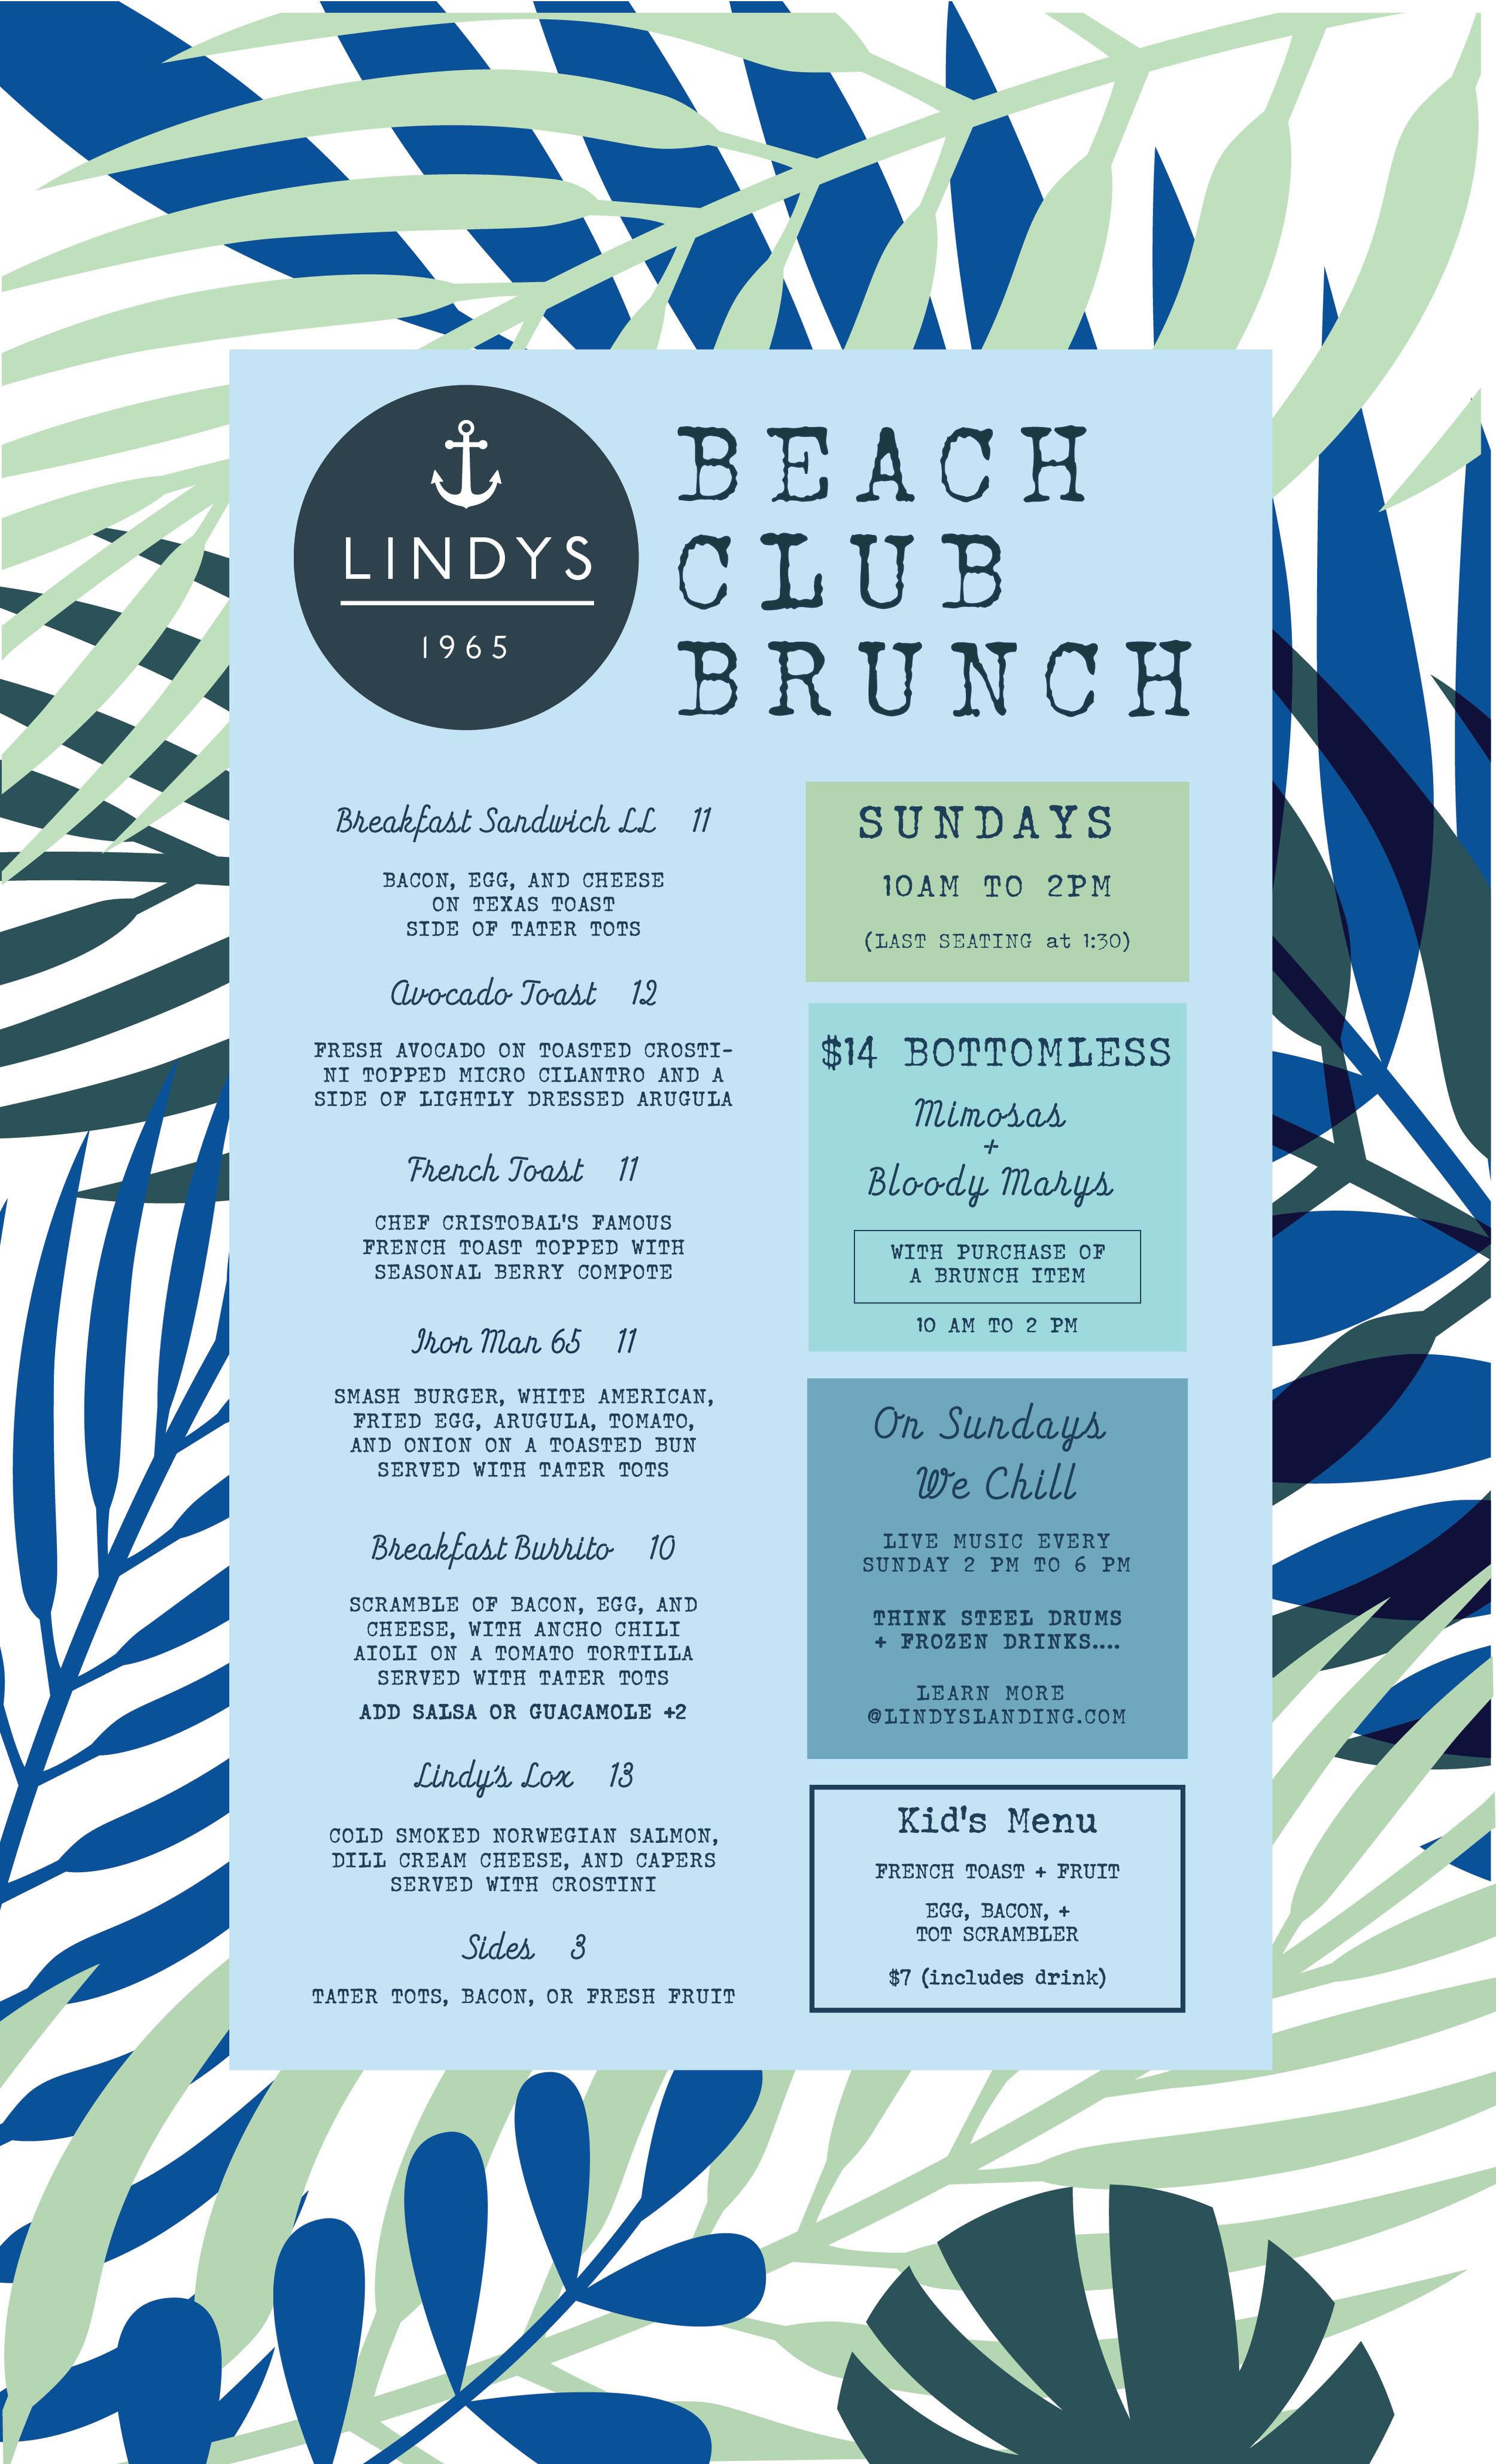 Lindy's Beach Club Brunch Final 1.4_menu.png